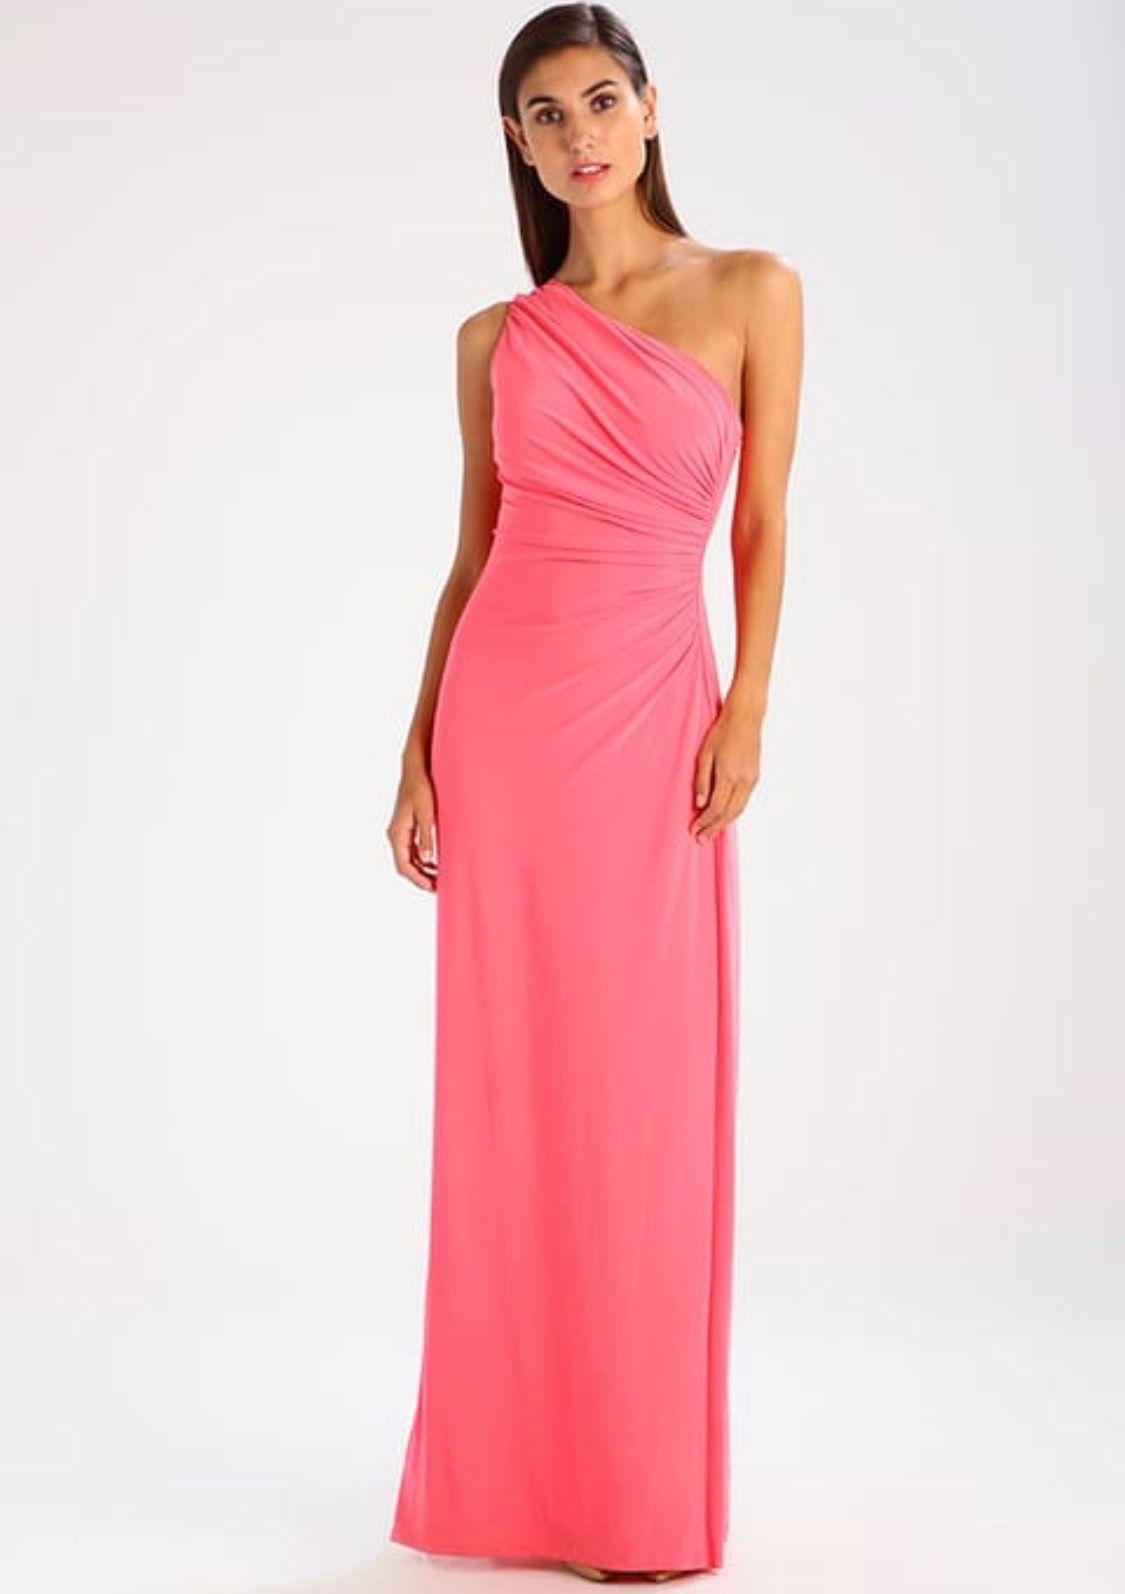 Ralph Cherry Lauren Impress BlossomDressed Dresses To OiTukXZP